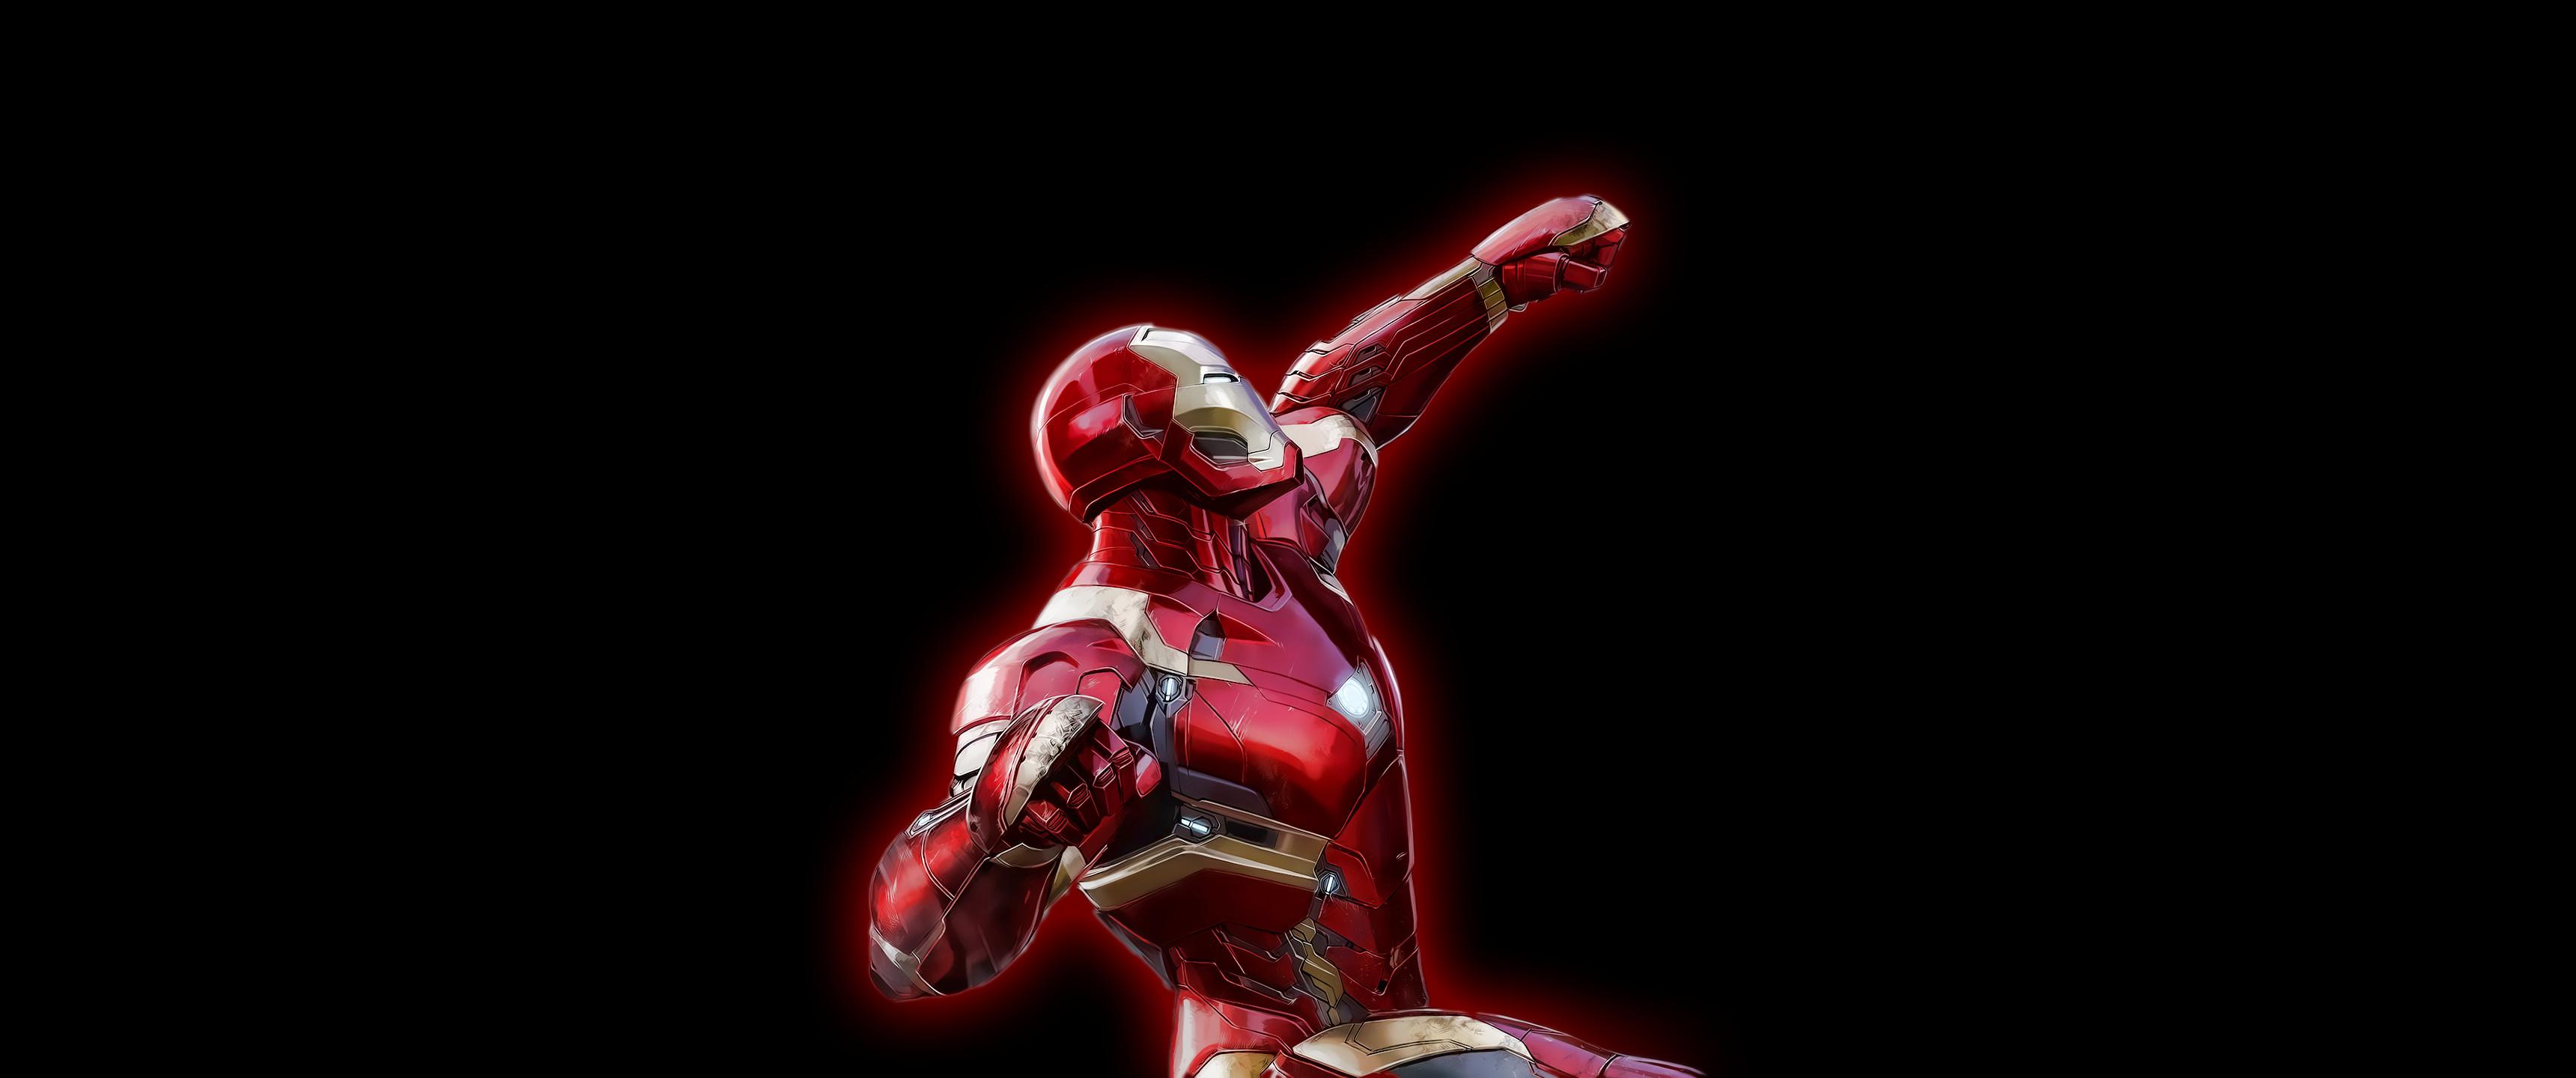 Iron Man wallpaper I made …